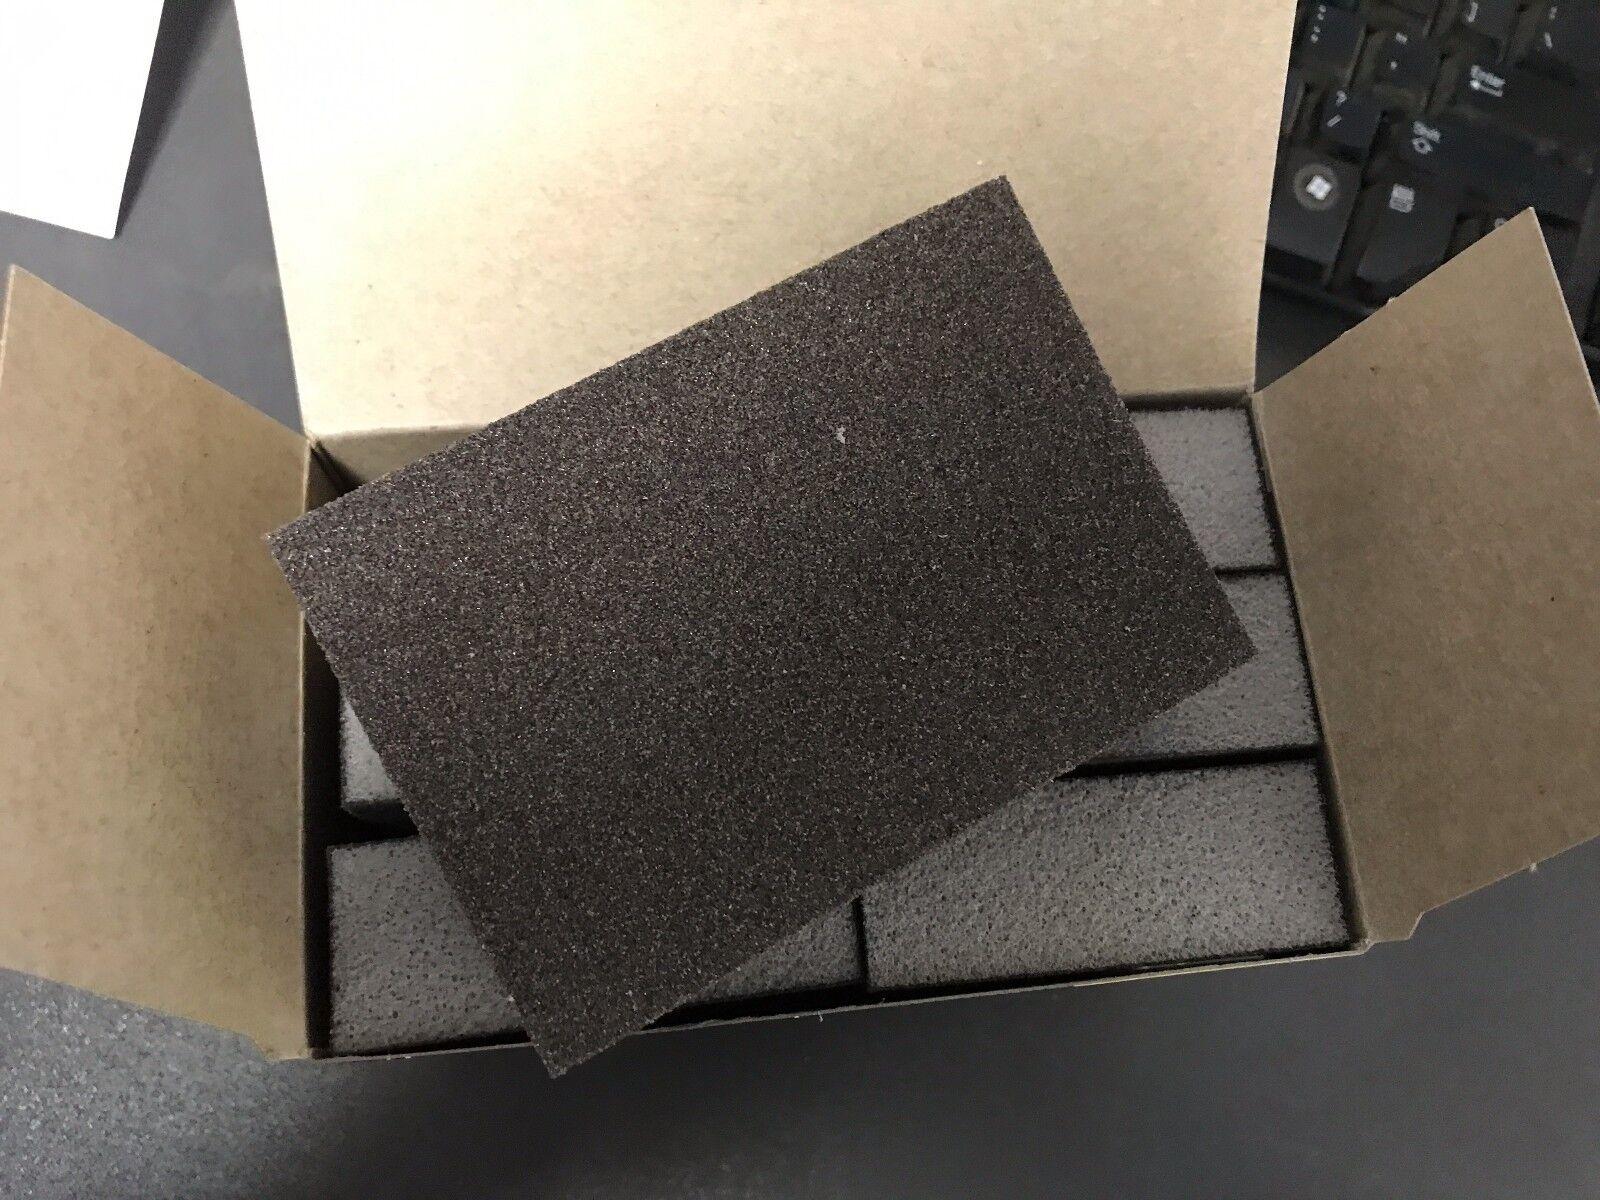 144 Sponge Lot 24-6 PACKS 3M Sanding Sponge Medium Grit Pro Pak BLOWOUT!